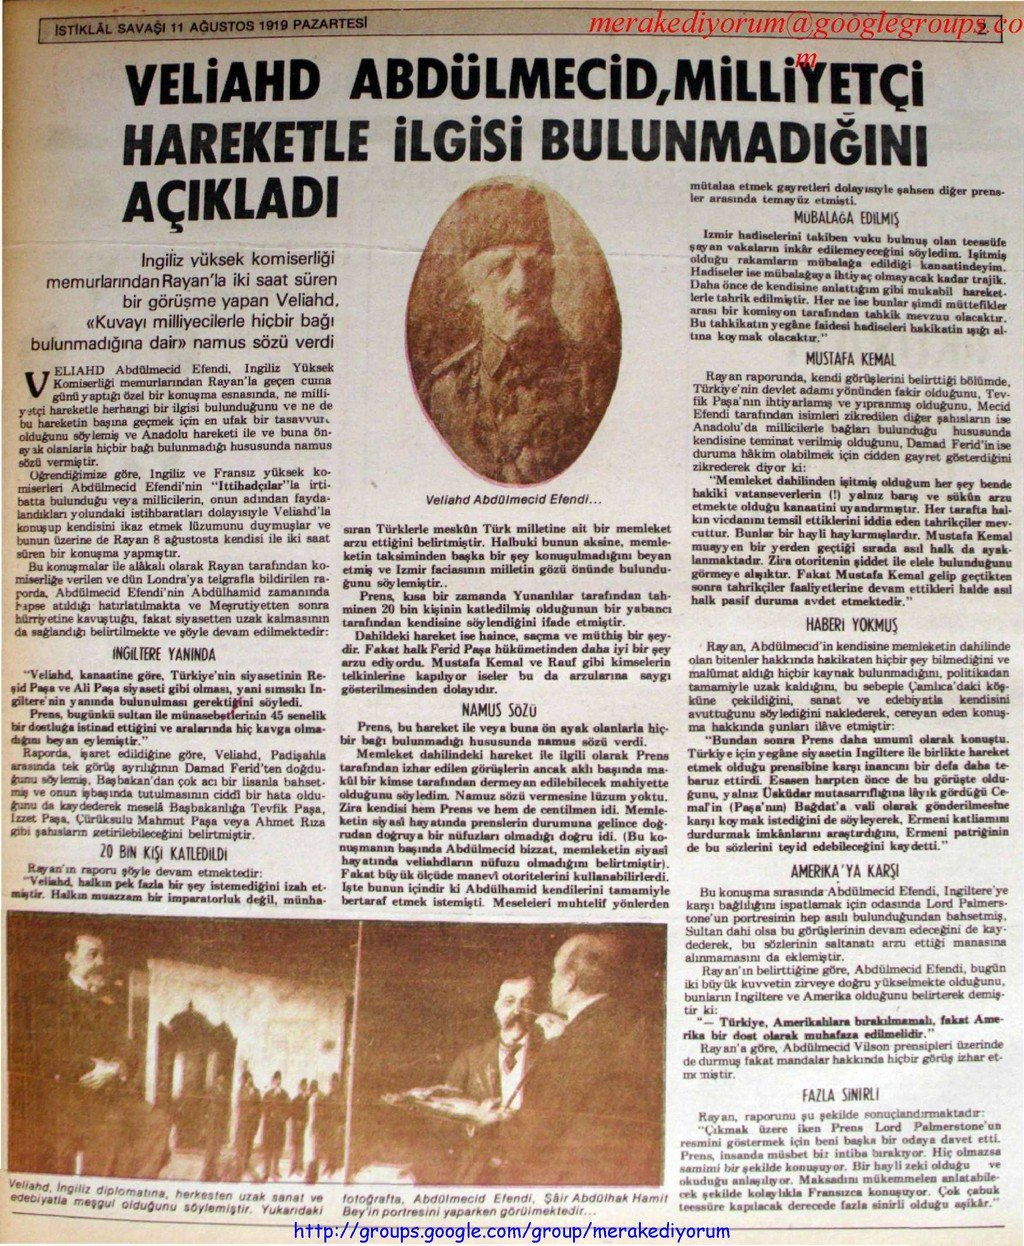 istiklal savaşı gazetesi - 11 ağustos 1919